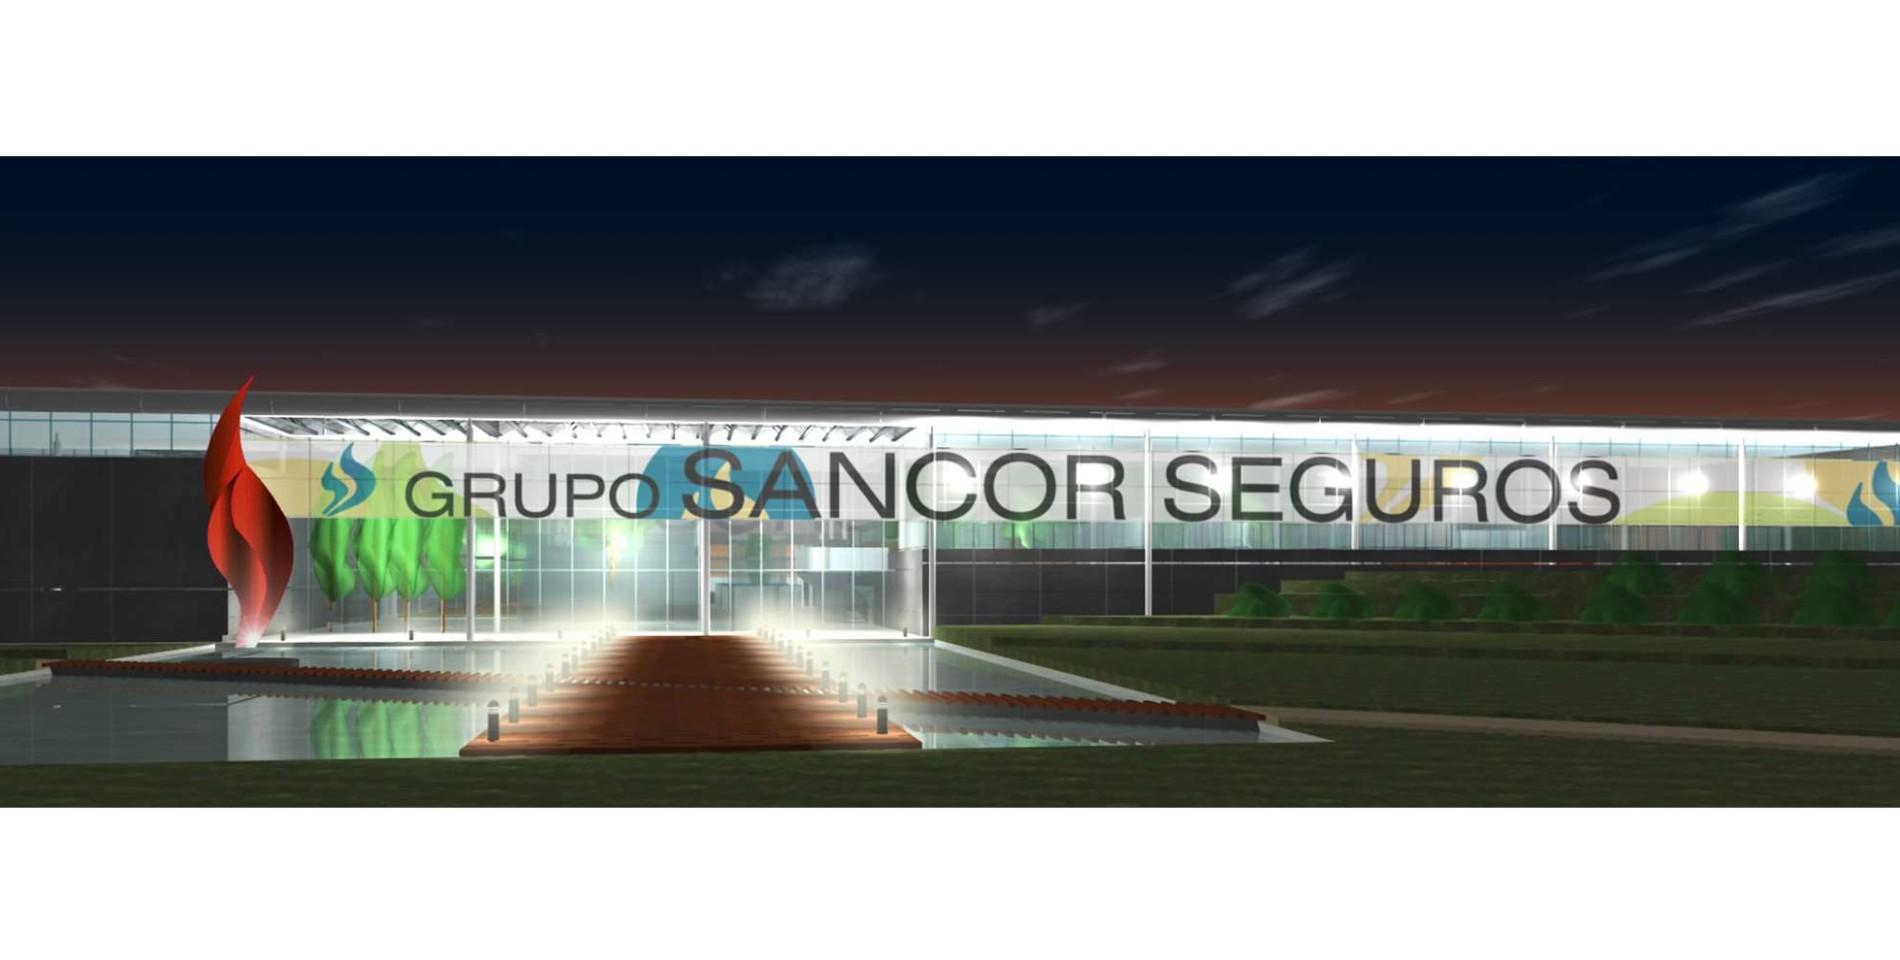 concurso-oficinas-sancor-seguros-3